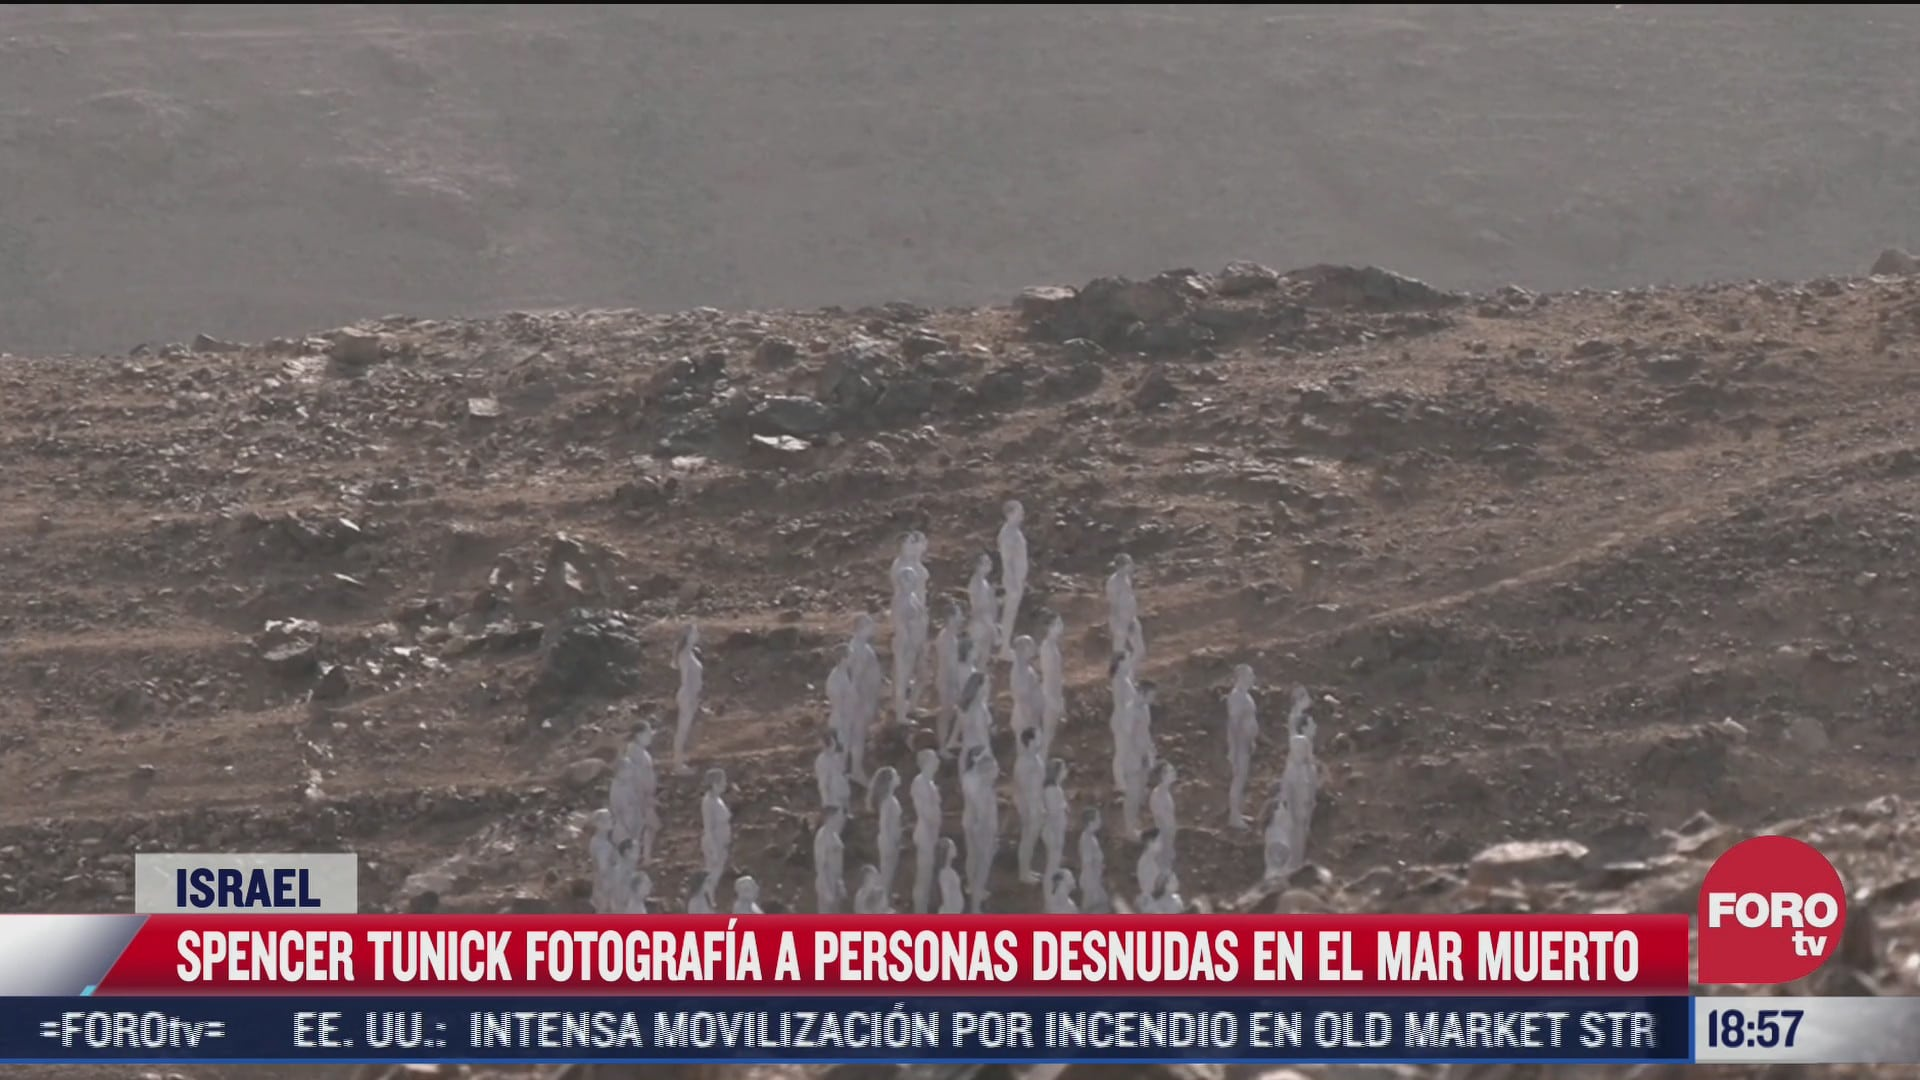 spencer tunick fotografia a personas desnudas en mar muerto